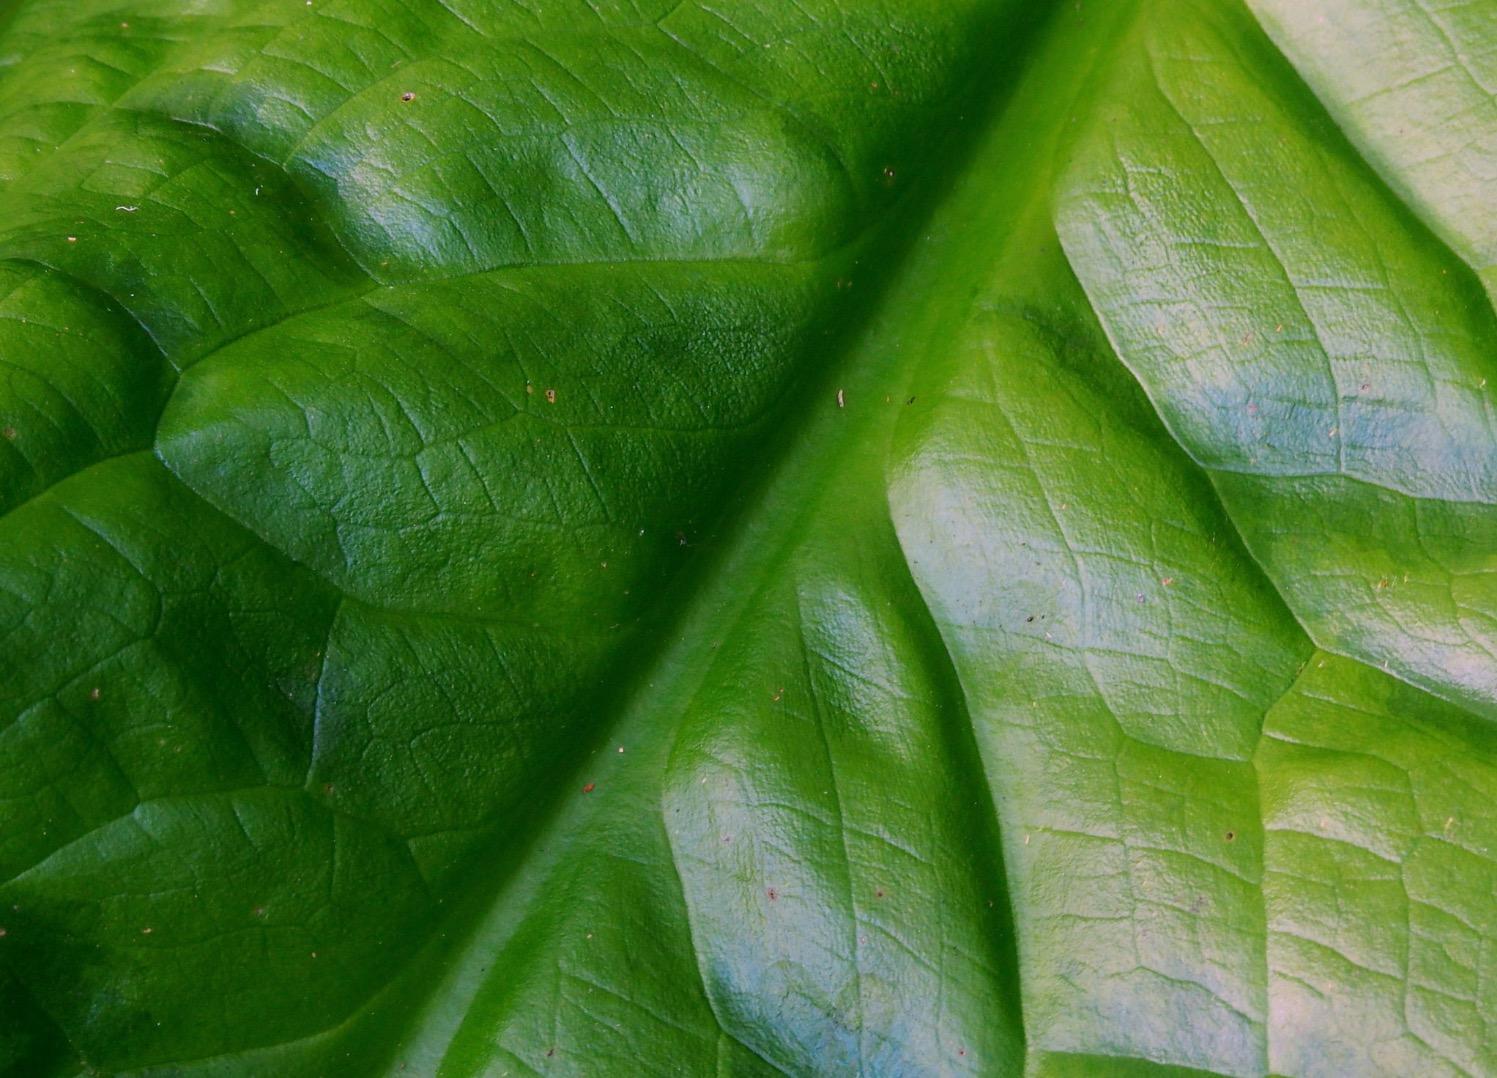 American skunk cabbage - Lysichiton americanus - leaf underside